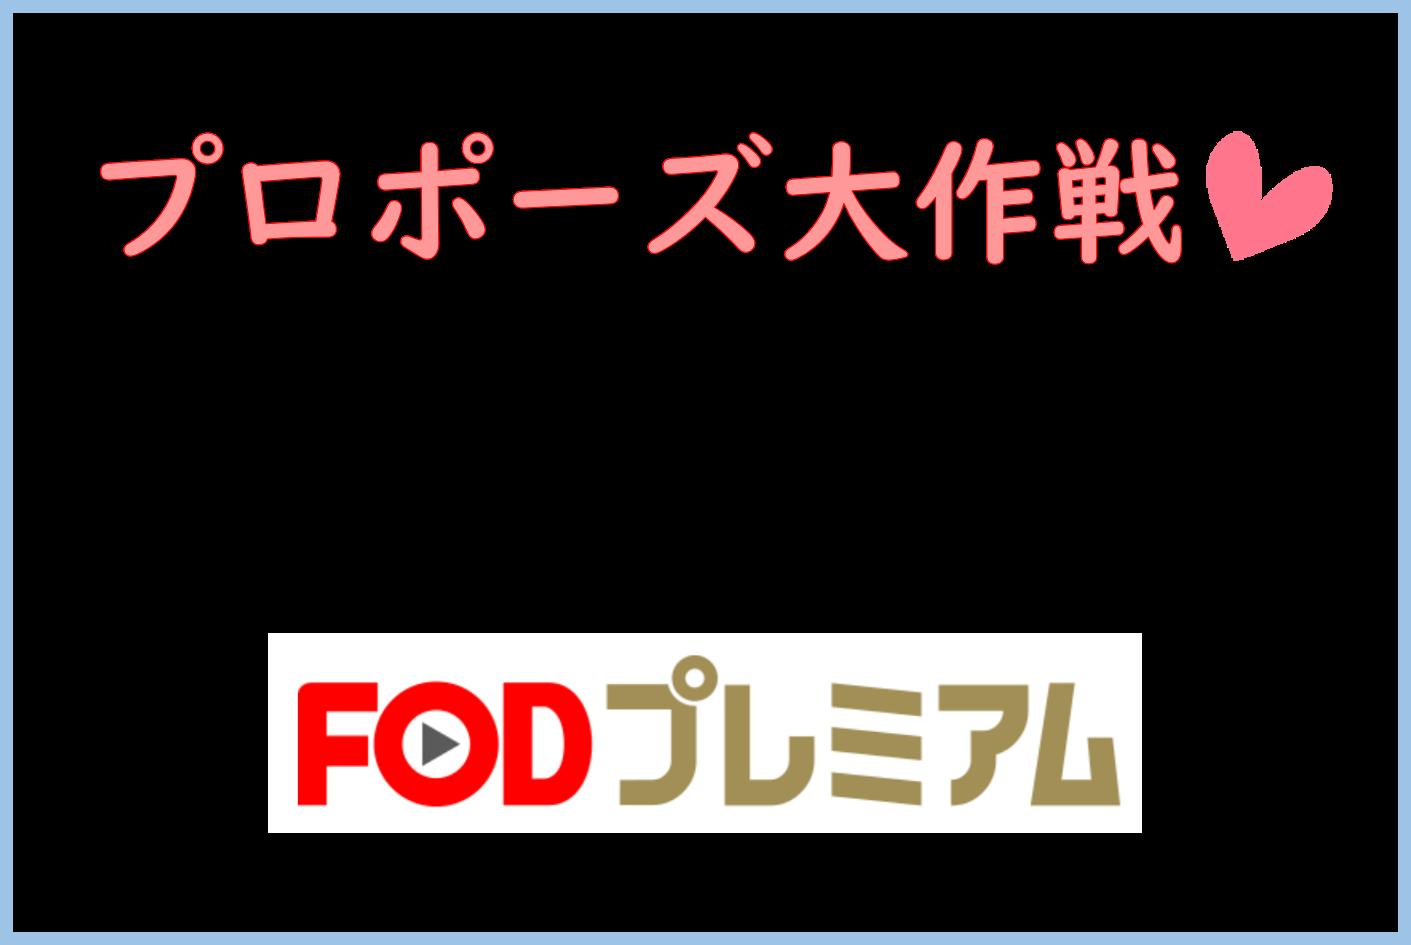 プロポーズ大作戦 動画配信